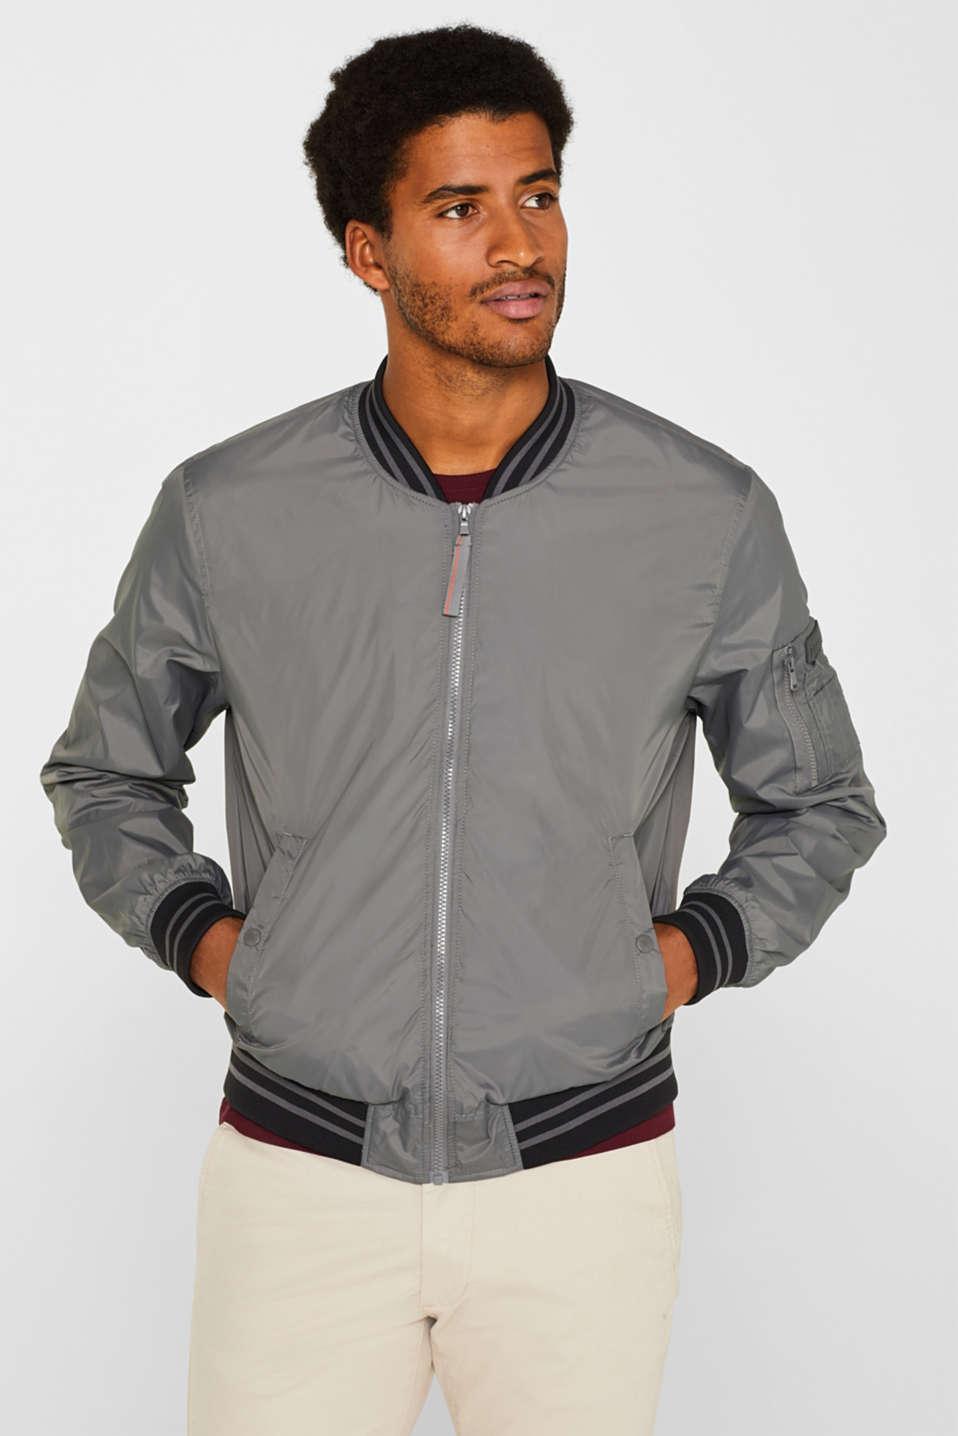 e282099f3 Esprit - Nylon bomber jacket at our Online Shop